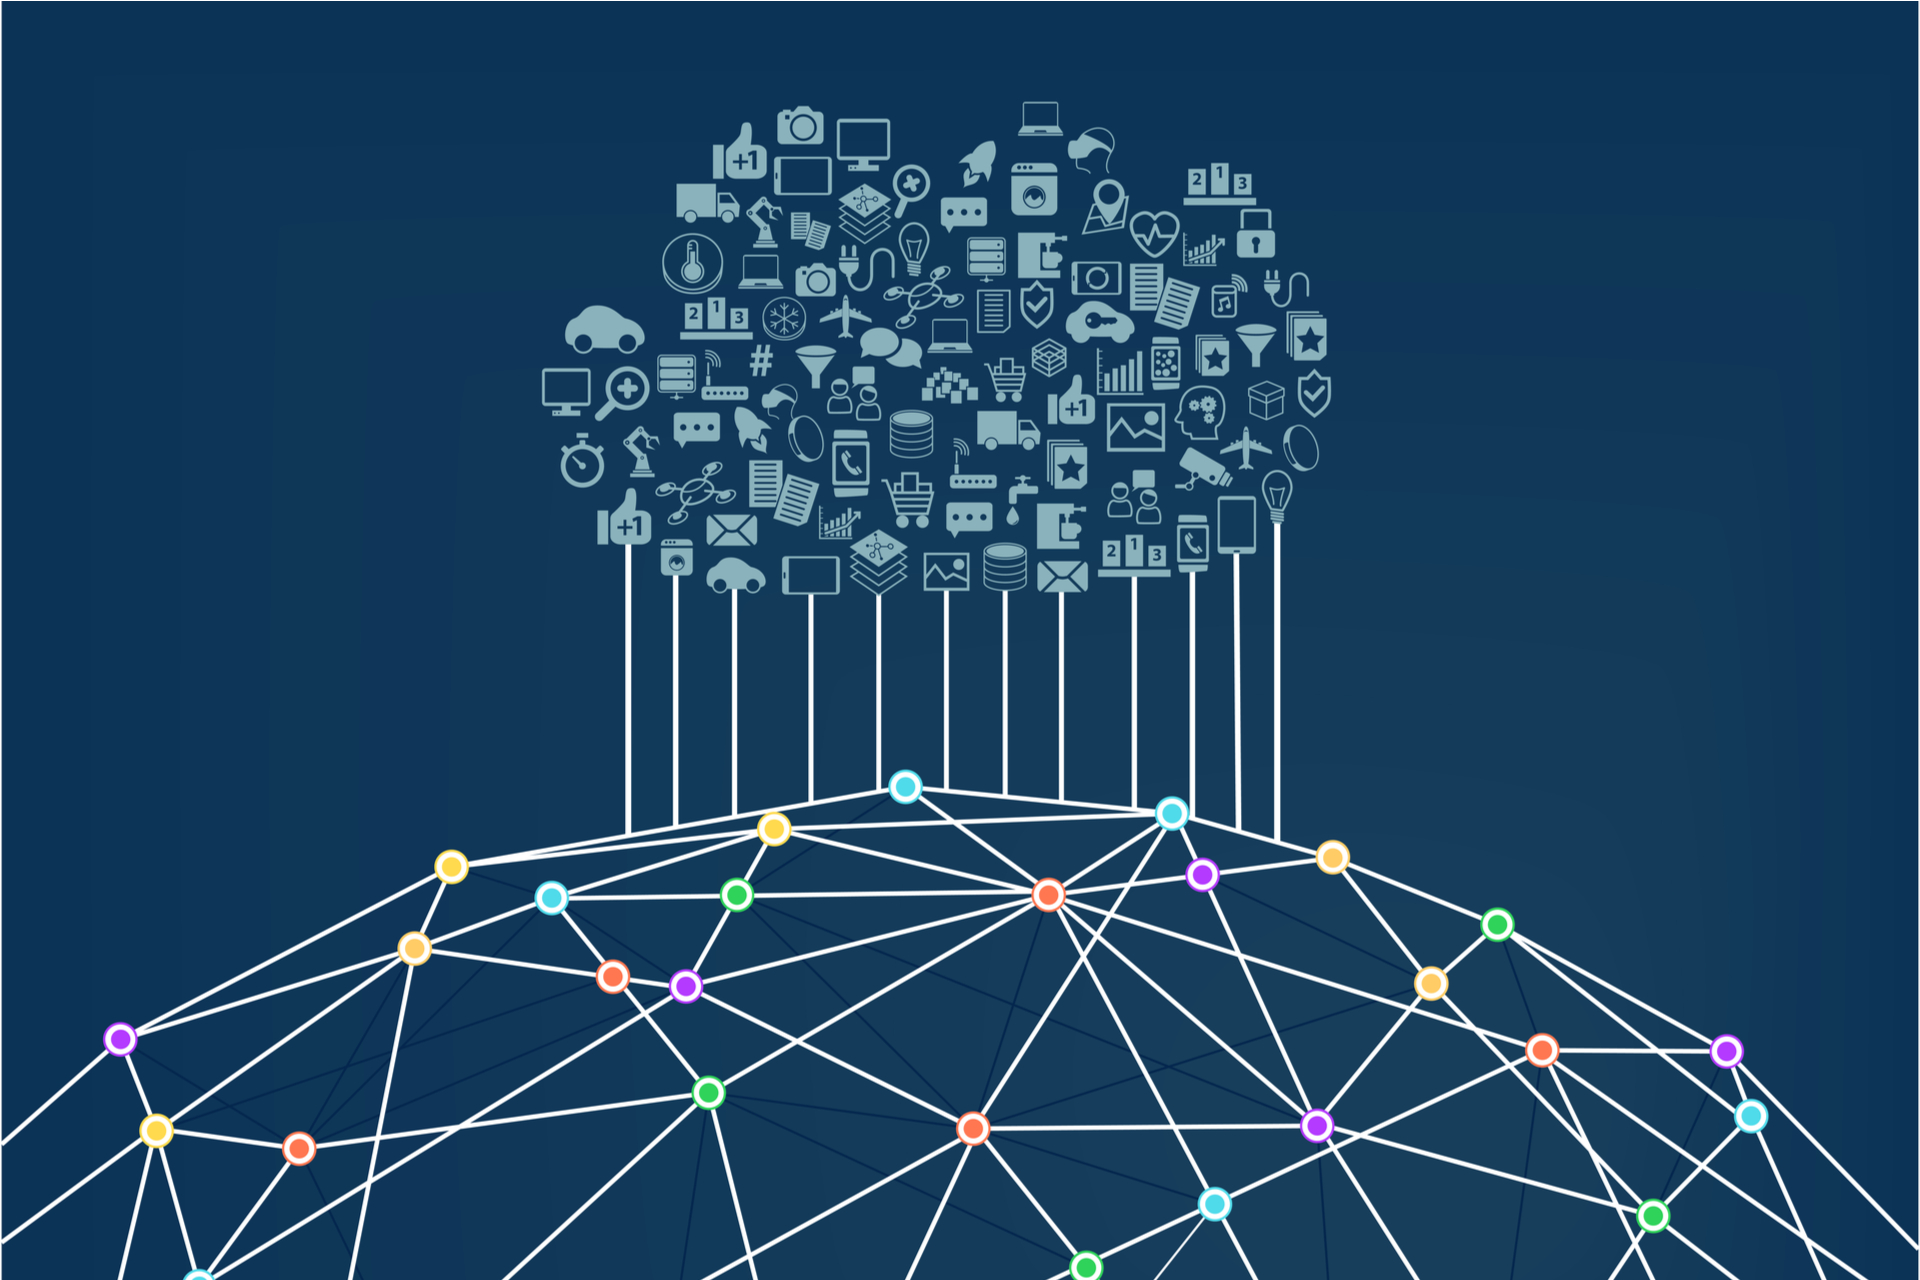 Financial services embrace hybrid cloud – but challenges remain